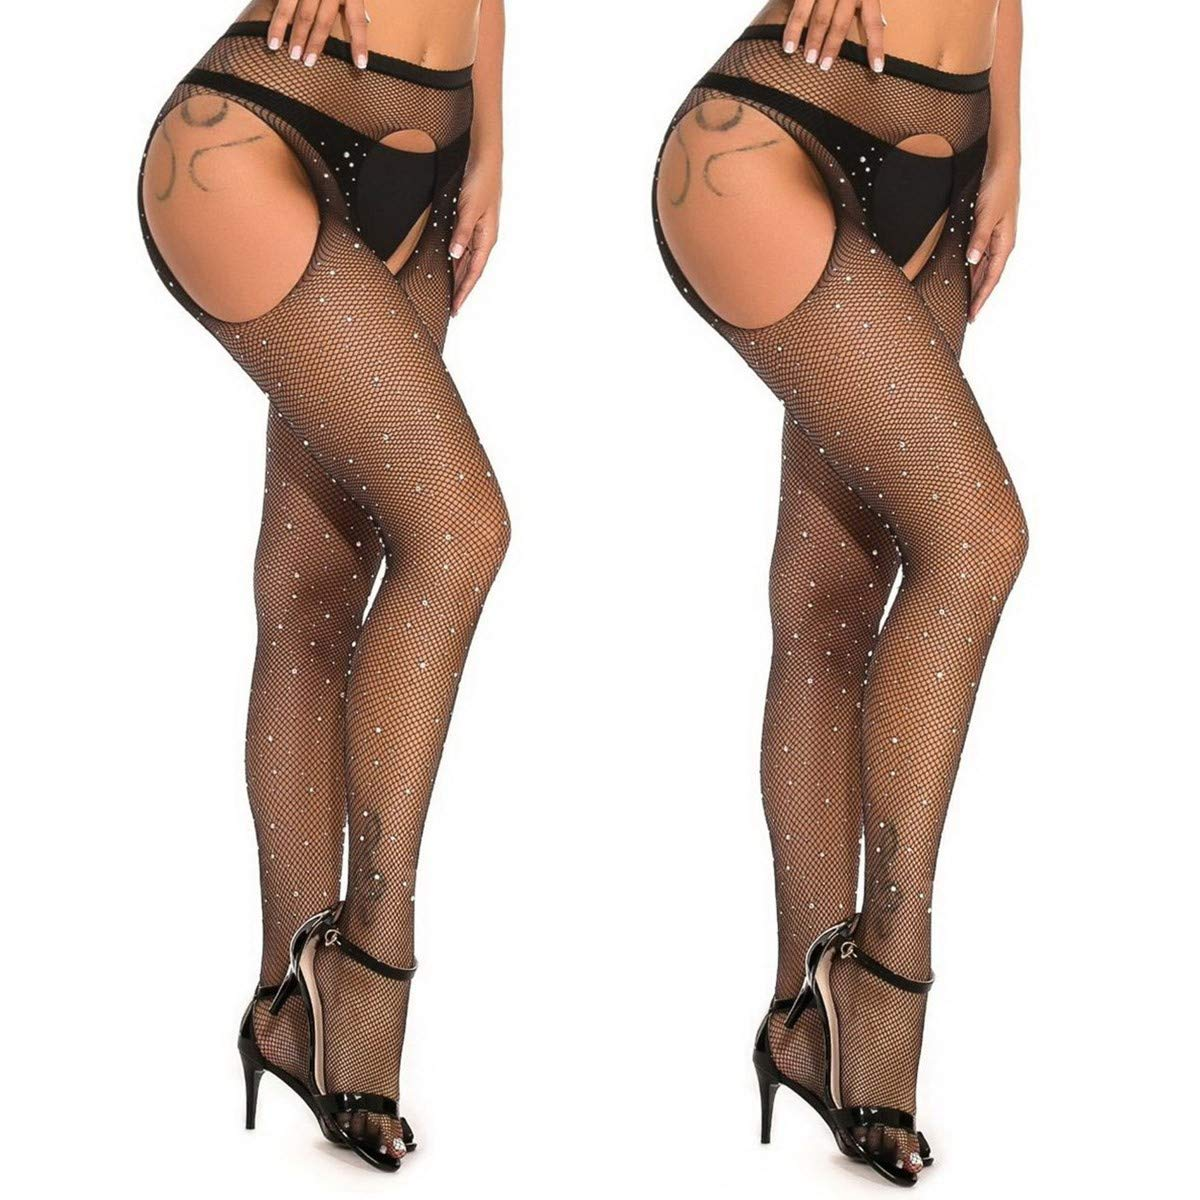 MengPa Fishnet Stockings Rhinestone High Waist Tights Pantyhose Sheer for Women